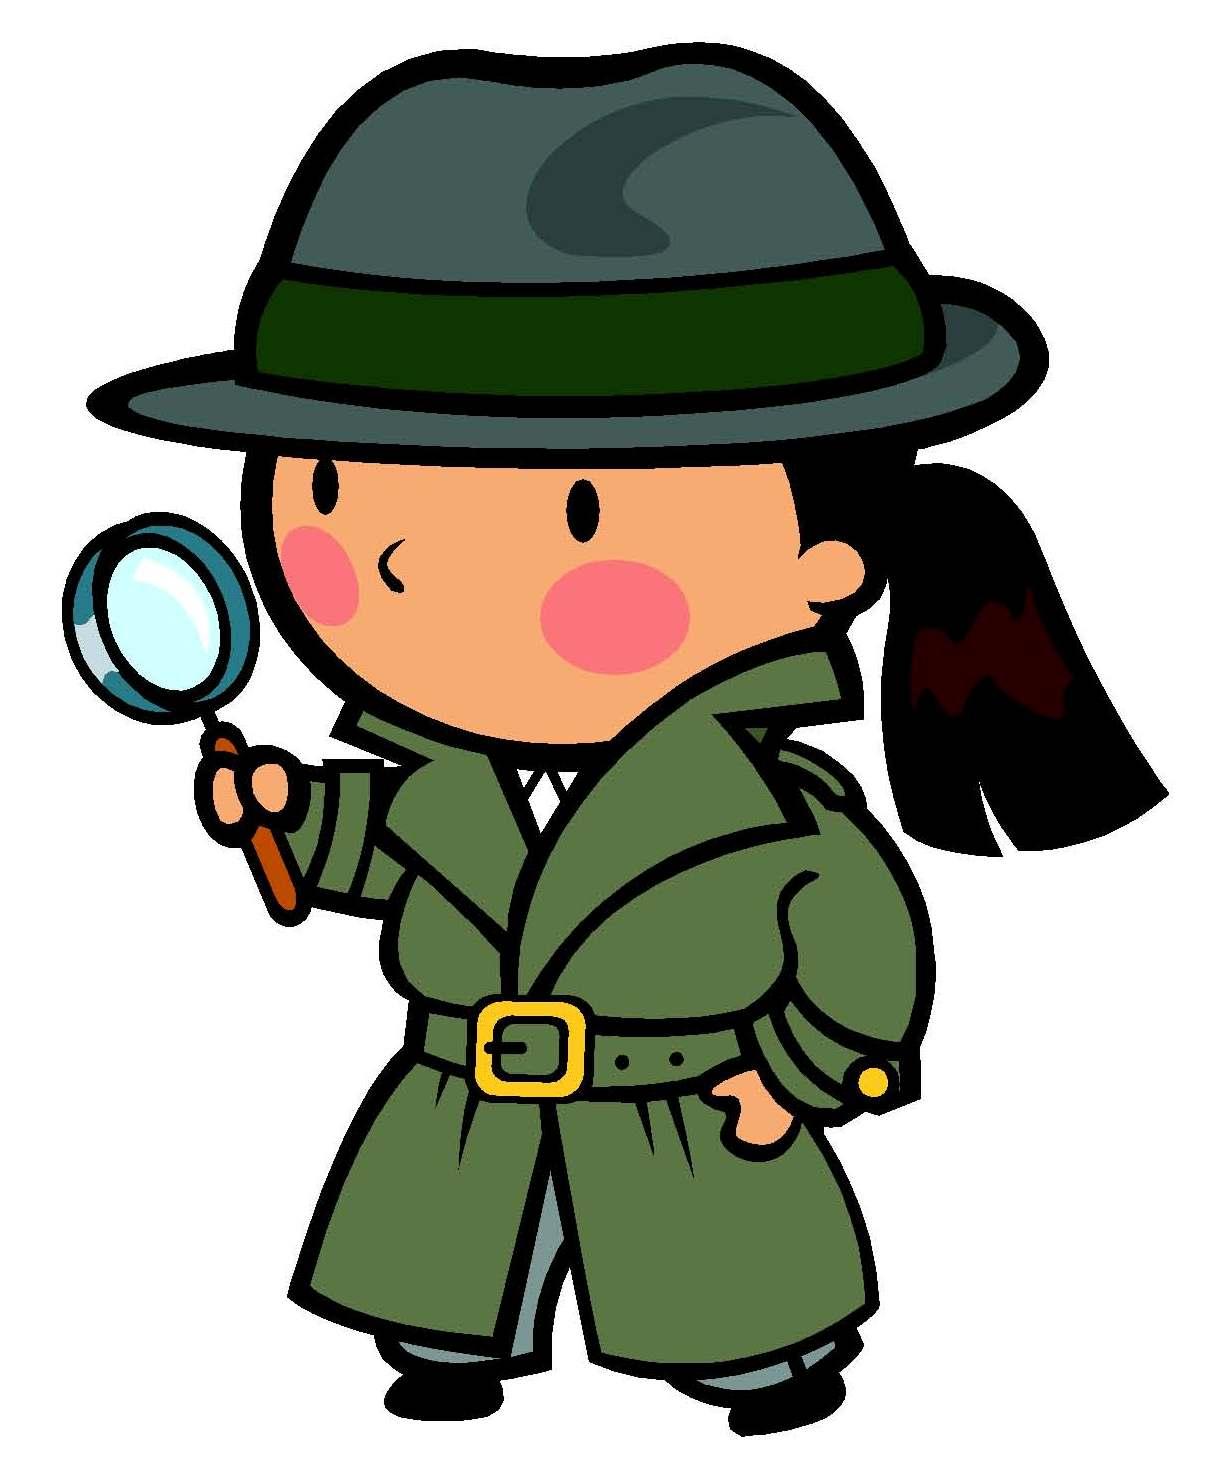 kid-detective-clipart-Detective-Girl.jpg